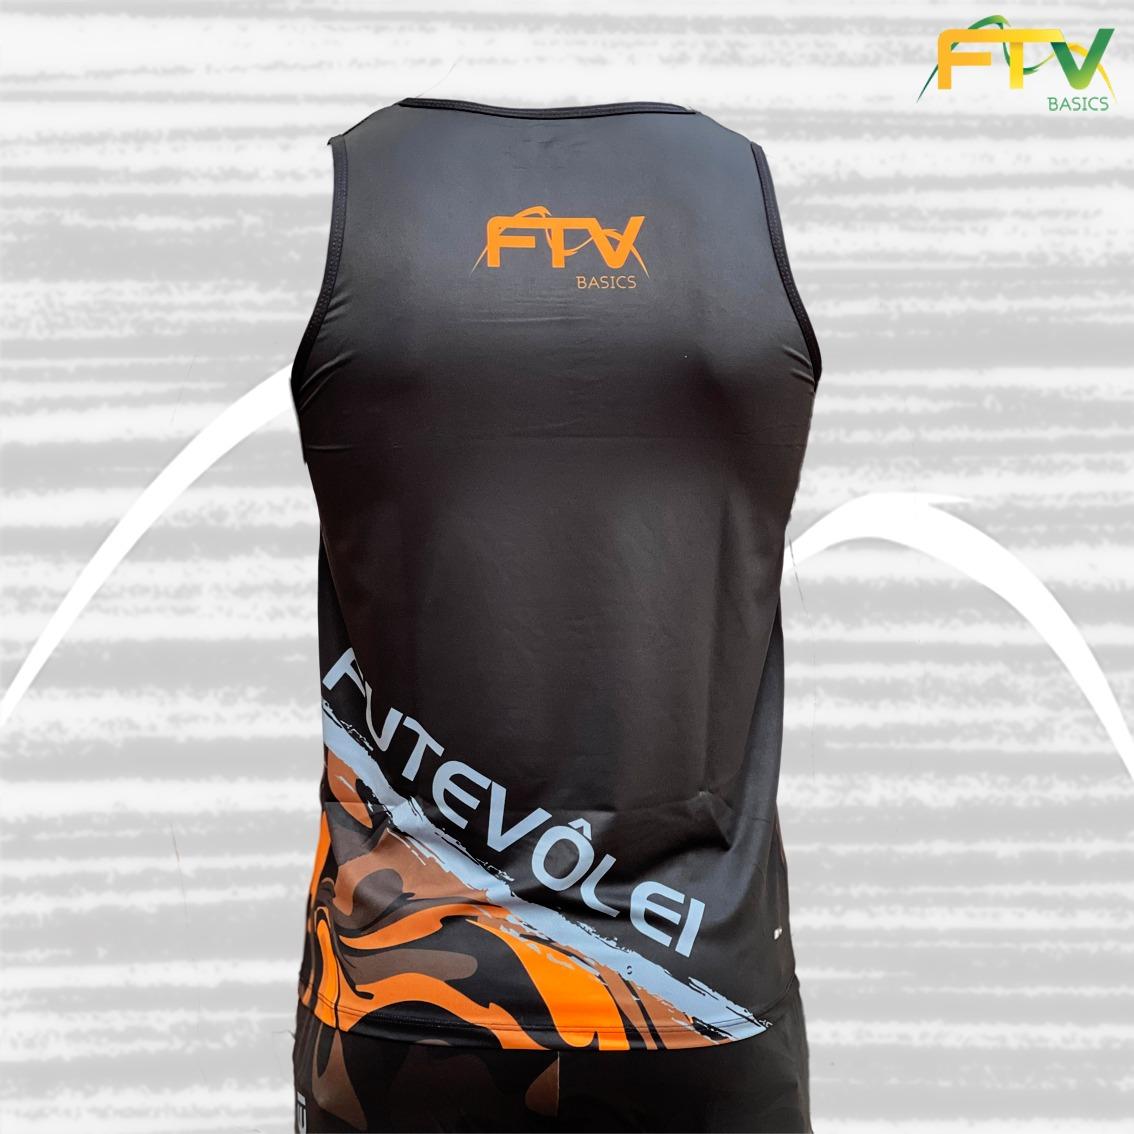 Regata FTV Basics 2021 Preto com Laranja